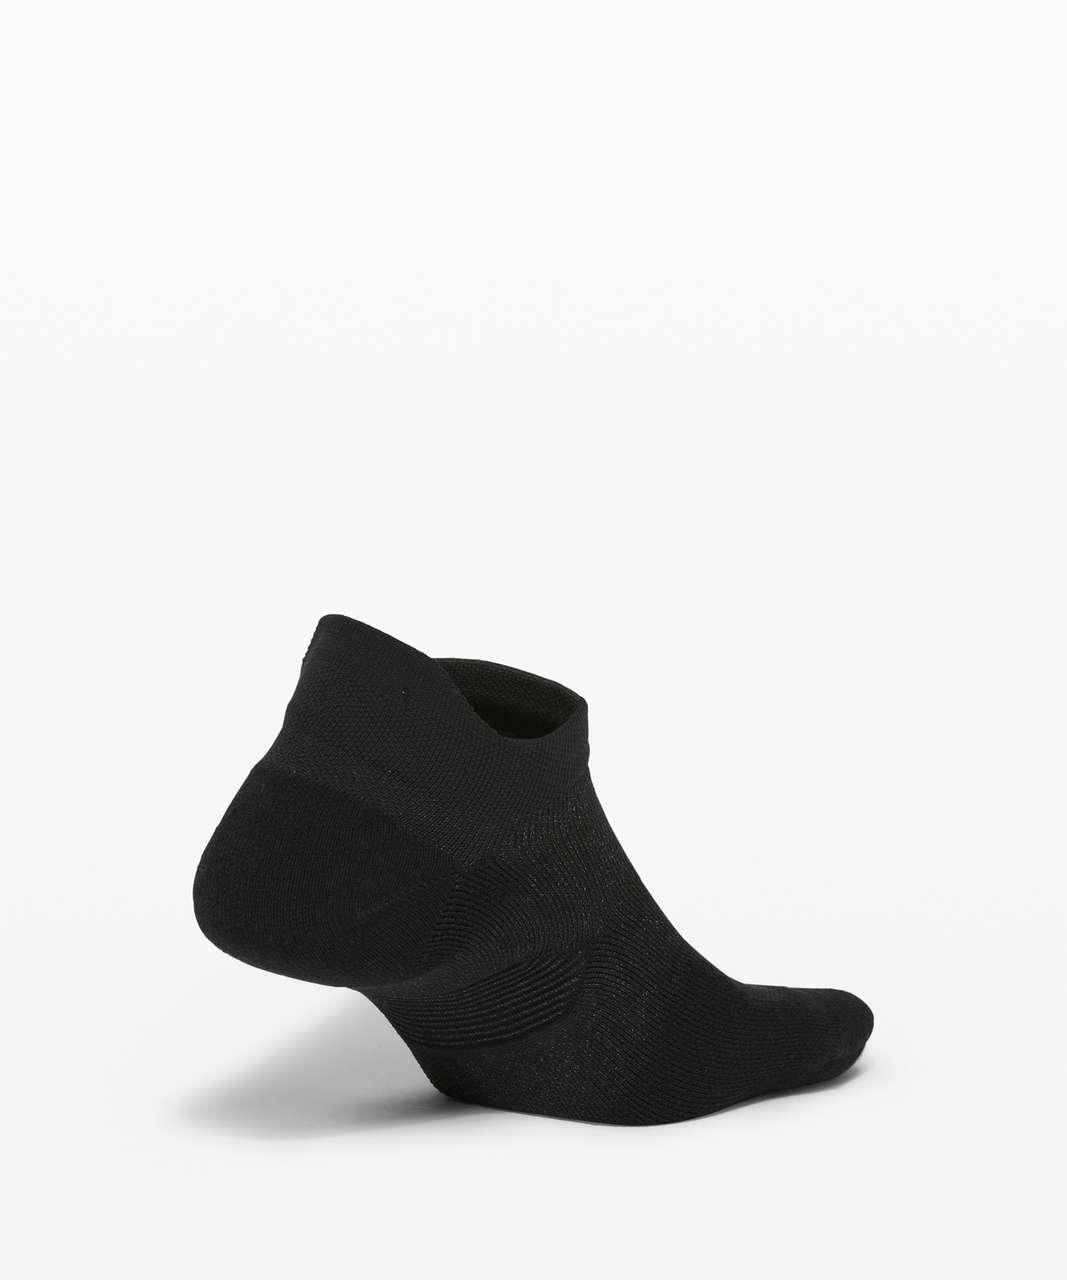 Lululemon Speed Sock *Silver - Black